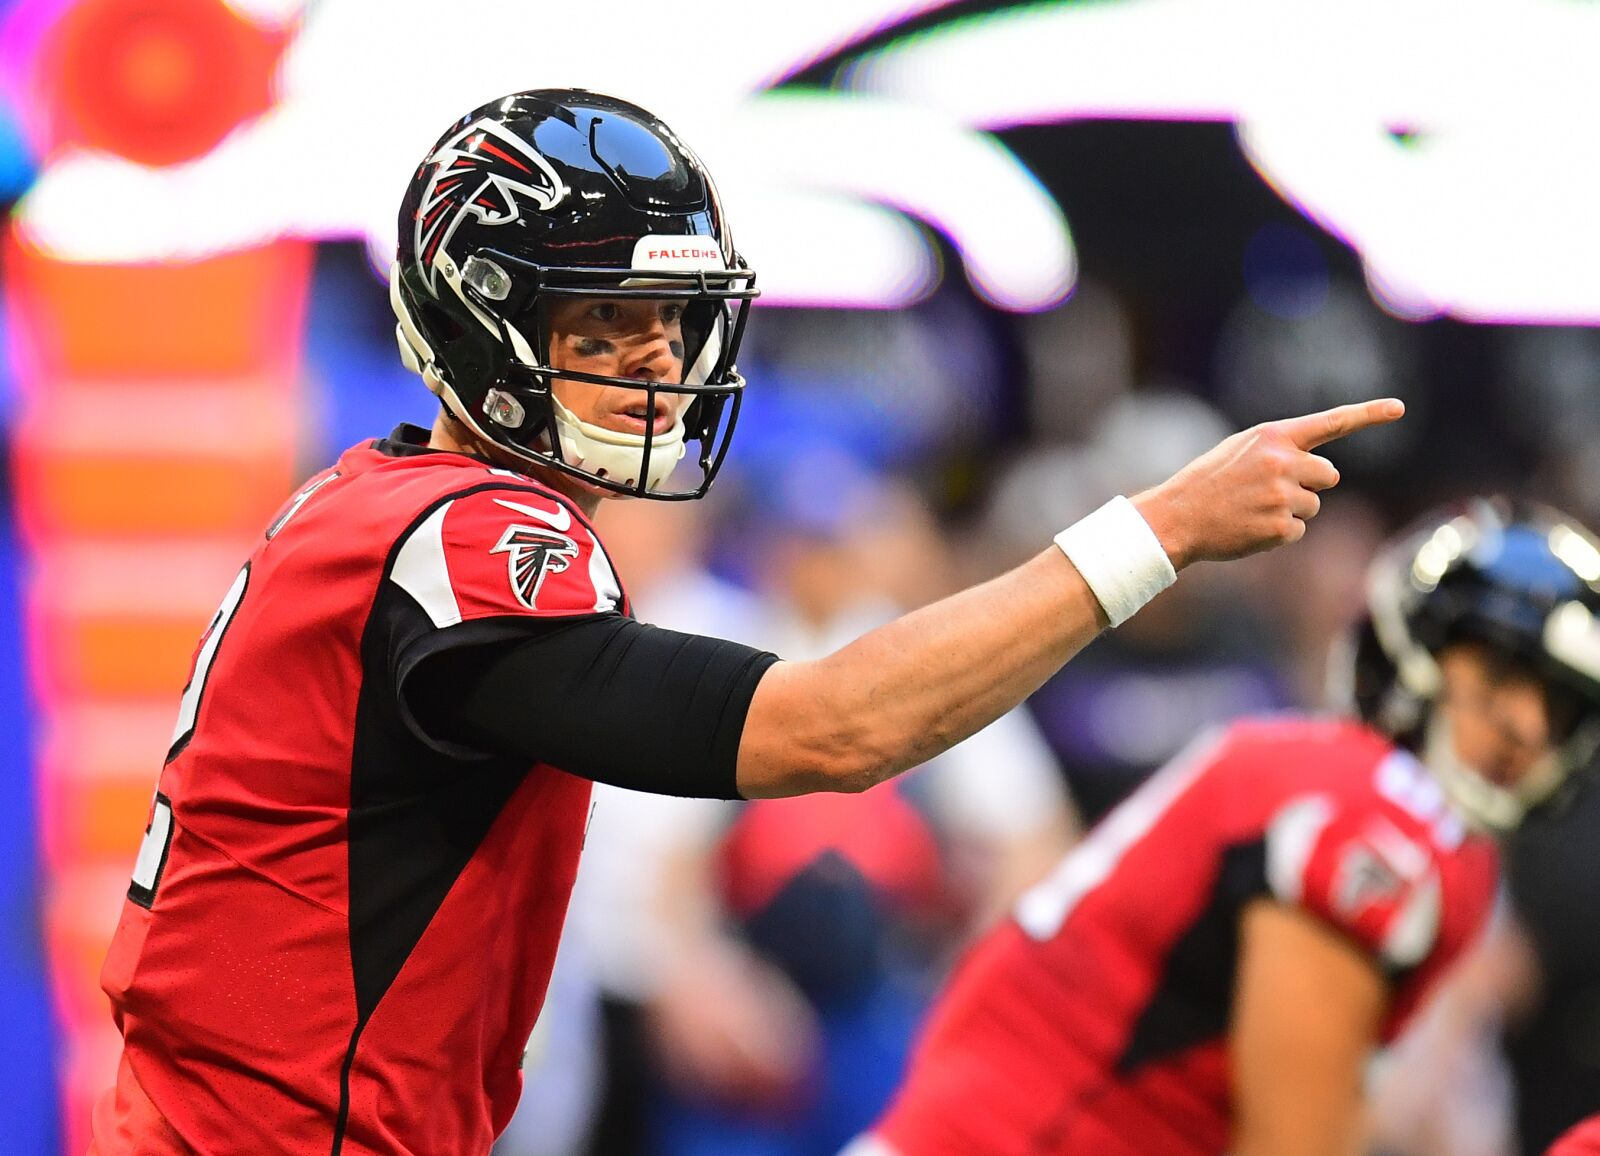 Could the Falcons Trade Matt Ryan Now & Draft Tua in 2020?